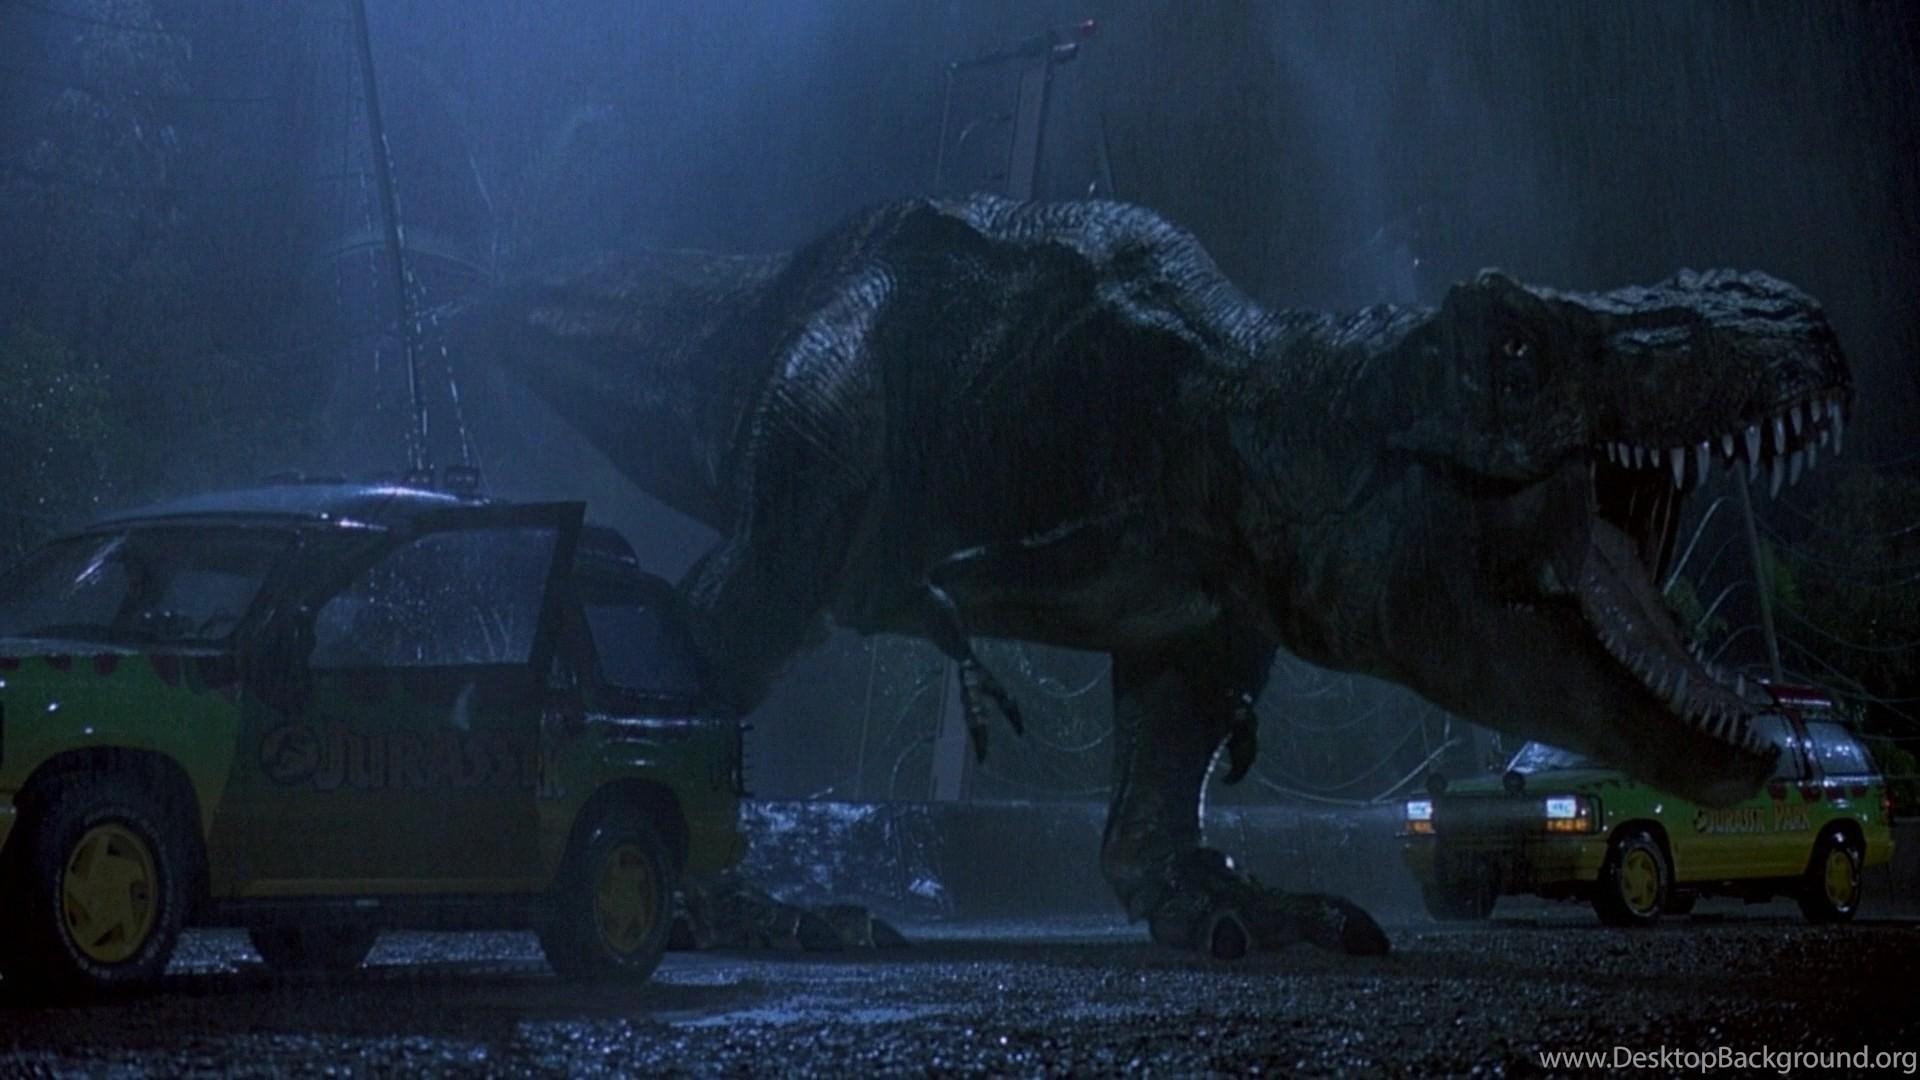 Movies Dinosaurs Jurassic Park Tyrannosaurus Rex Wallpapers